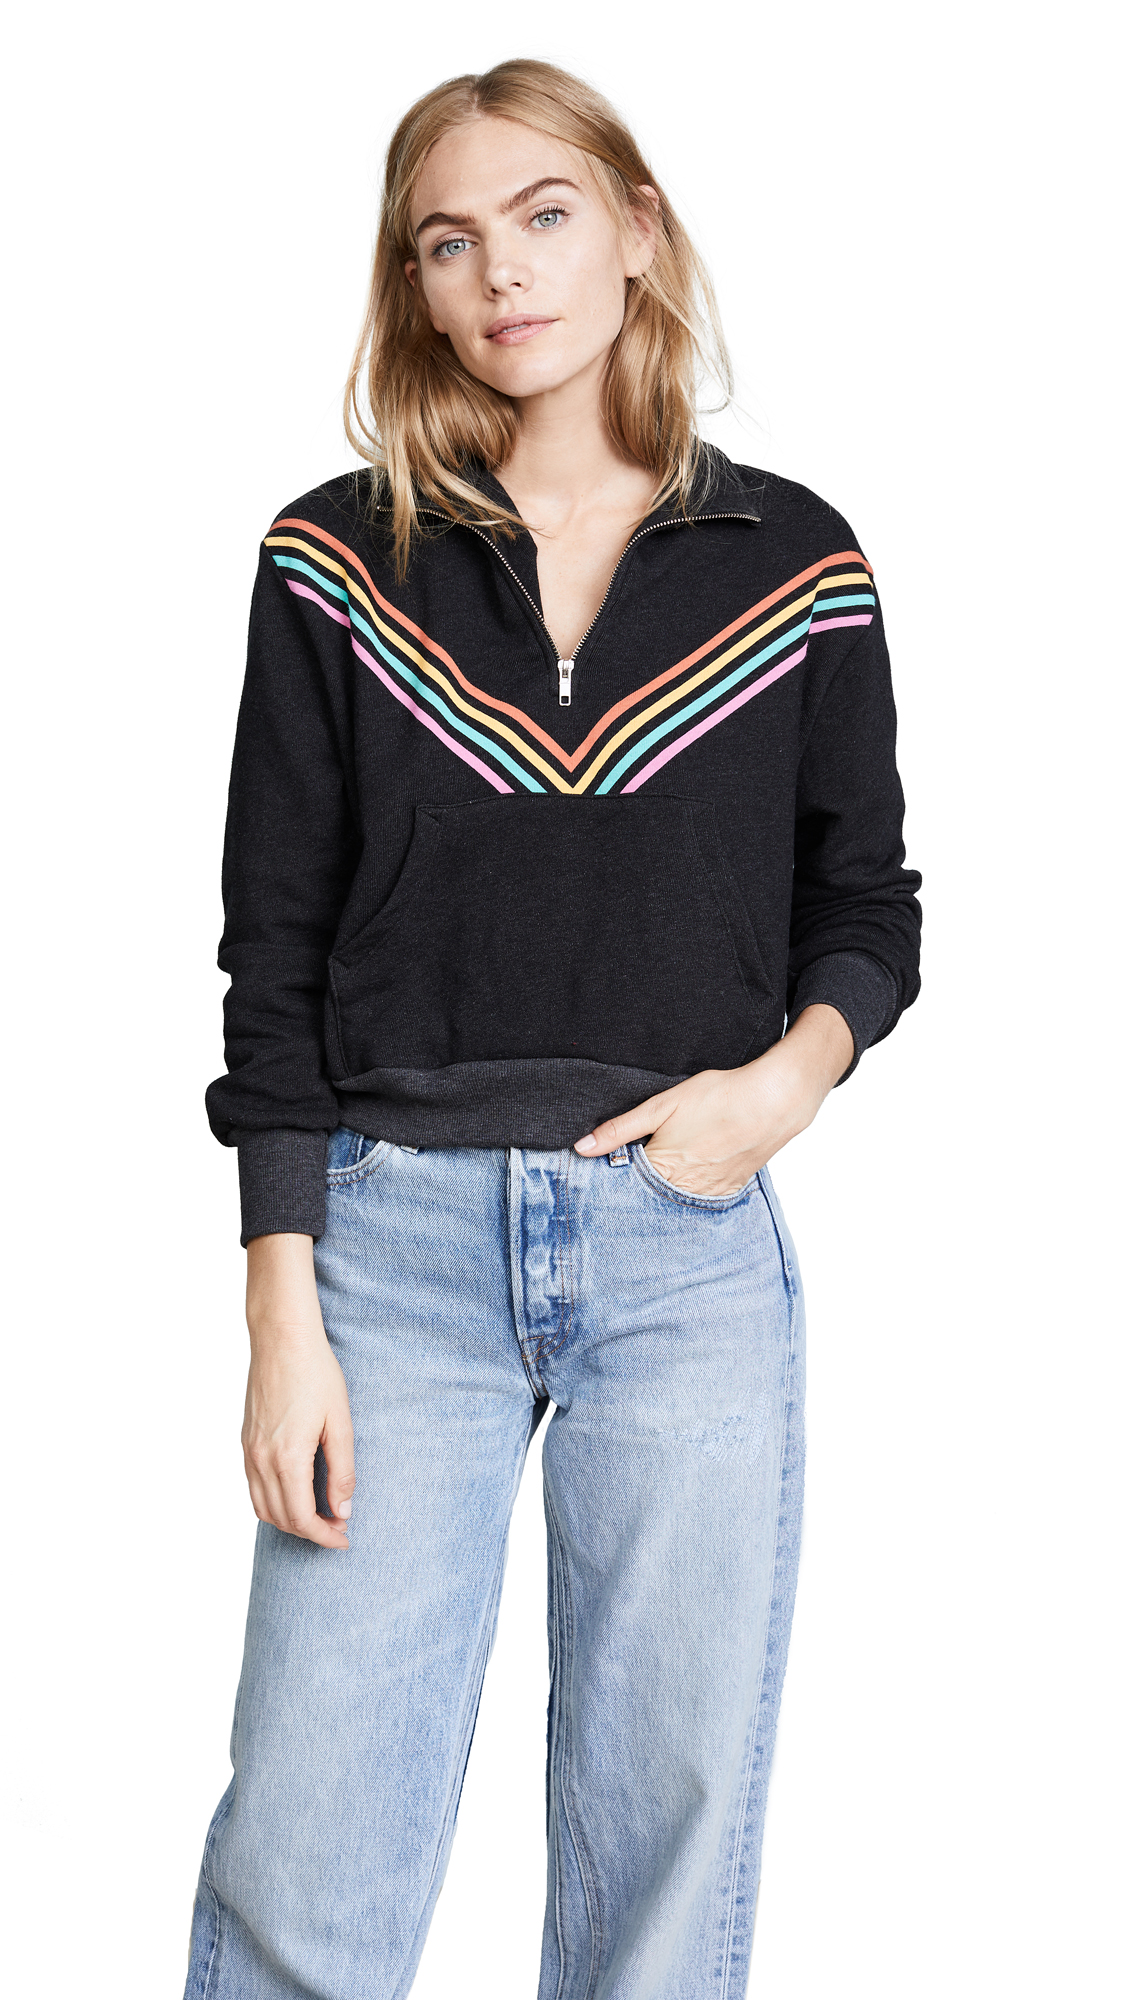 Wildfox '80s Track Star Soto Warm Up Sweatshirt